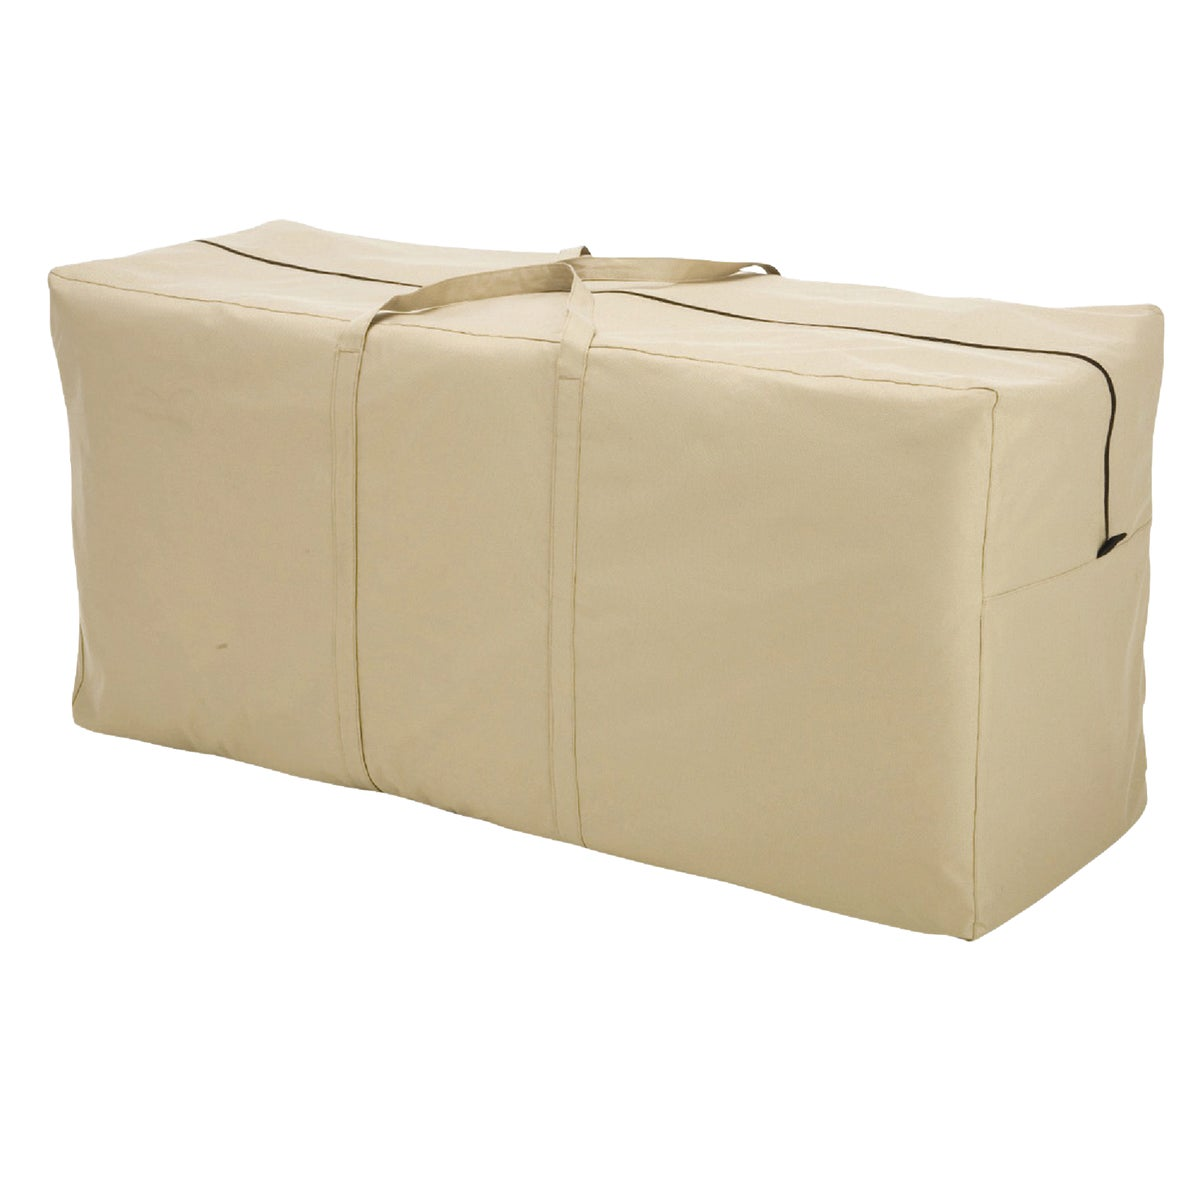 Classic Accessories TERAZO PATIO CUSHION BAG 58982